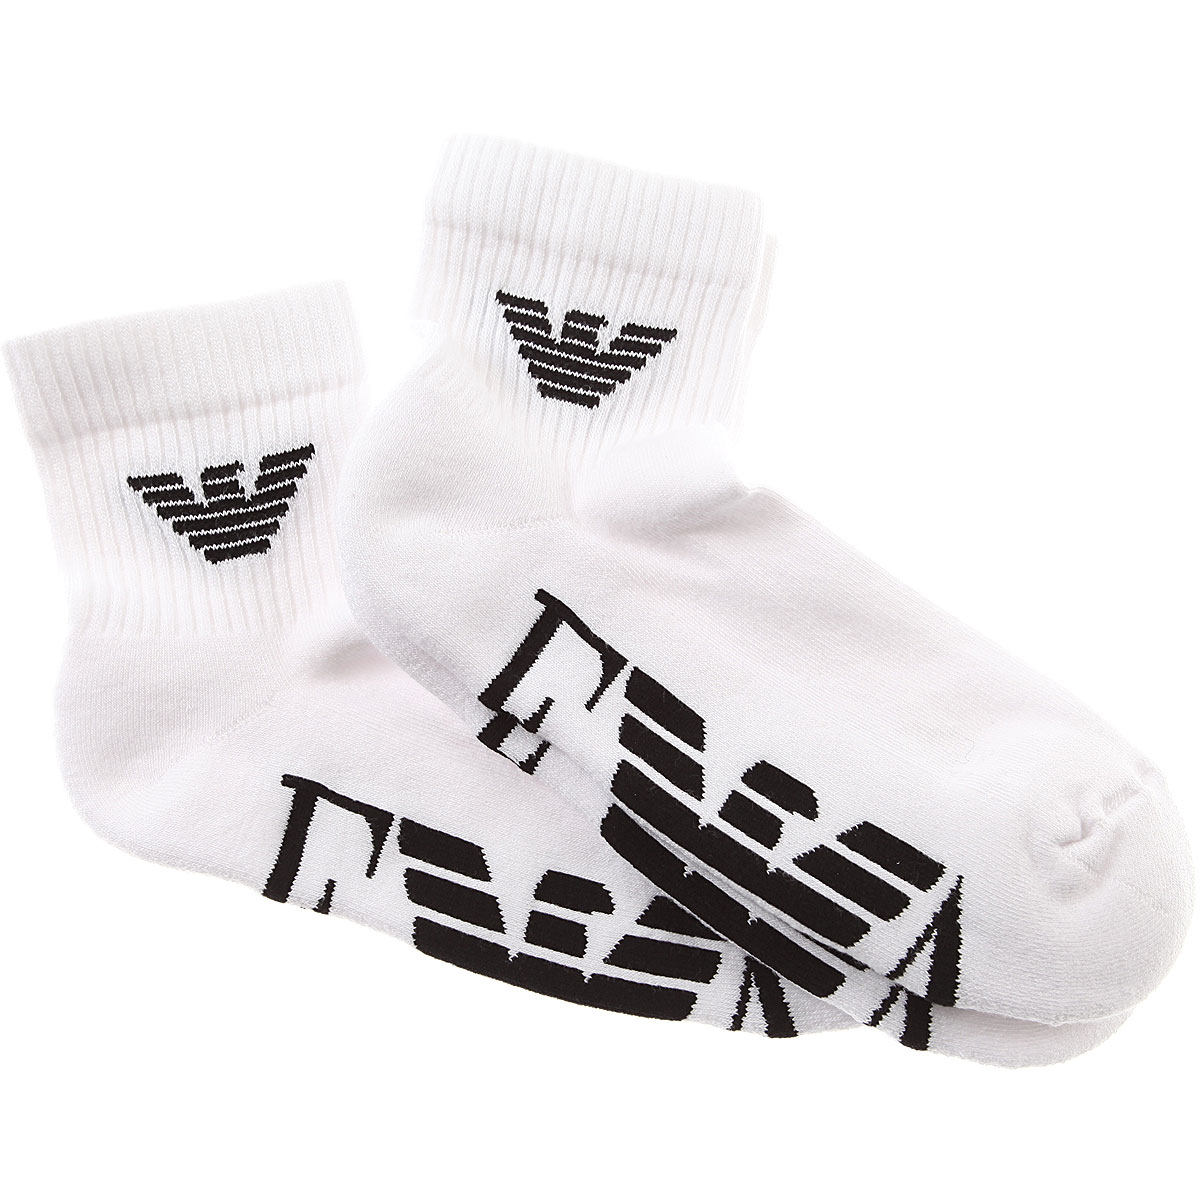 18b89b5b0b16 Emporio Armani Socks. Underwear for Men